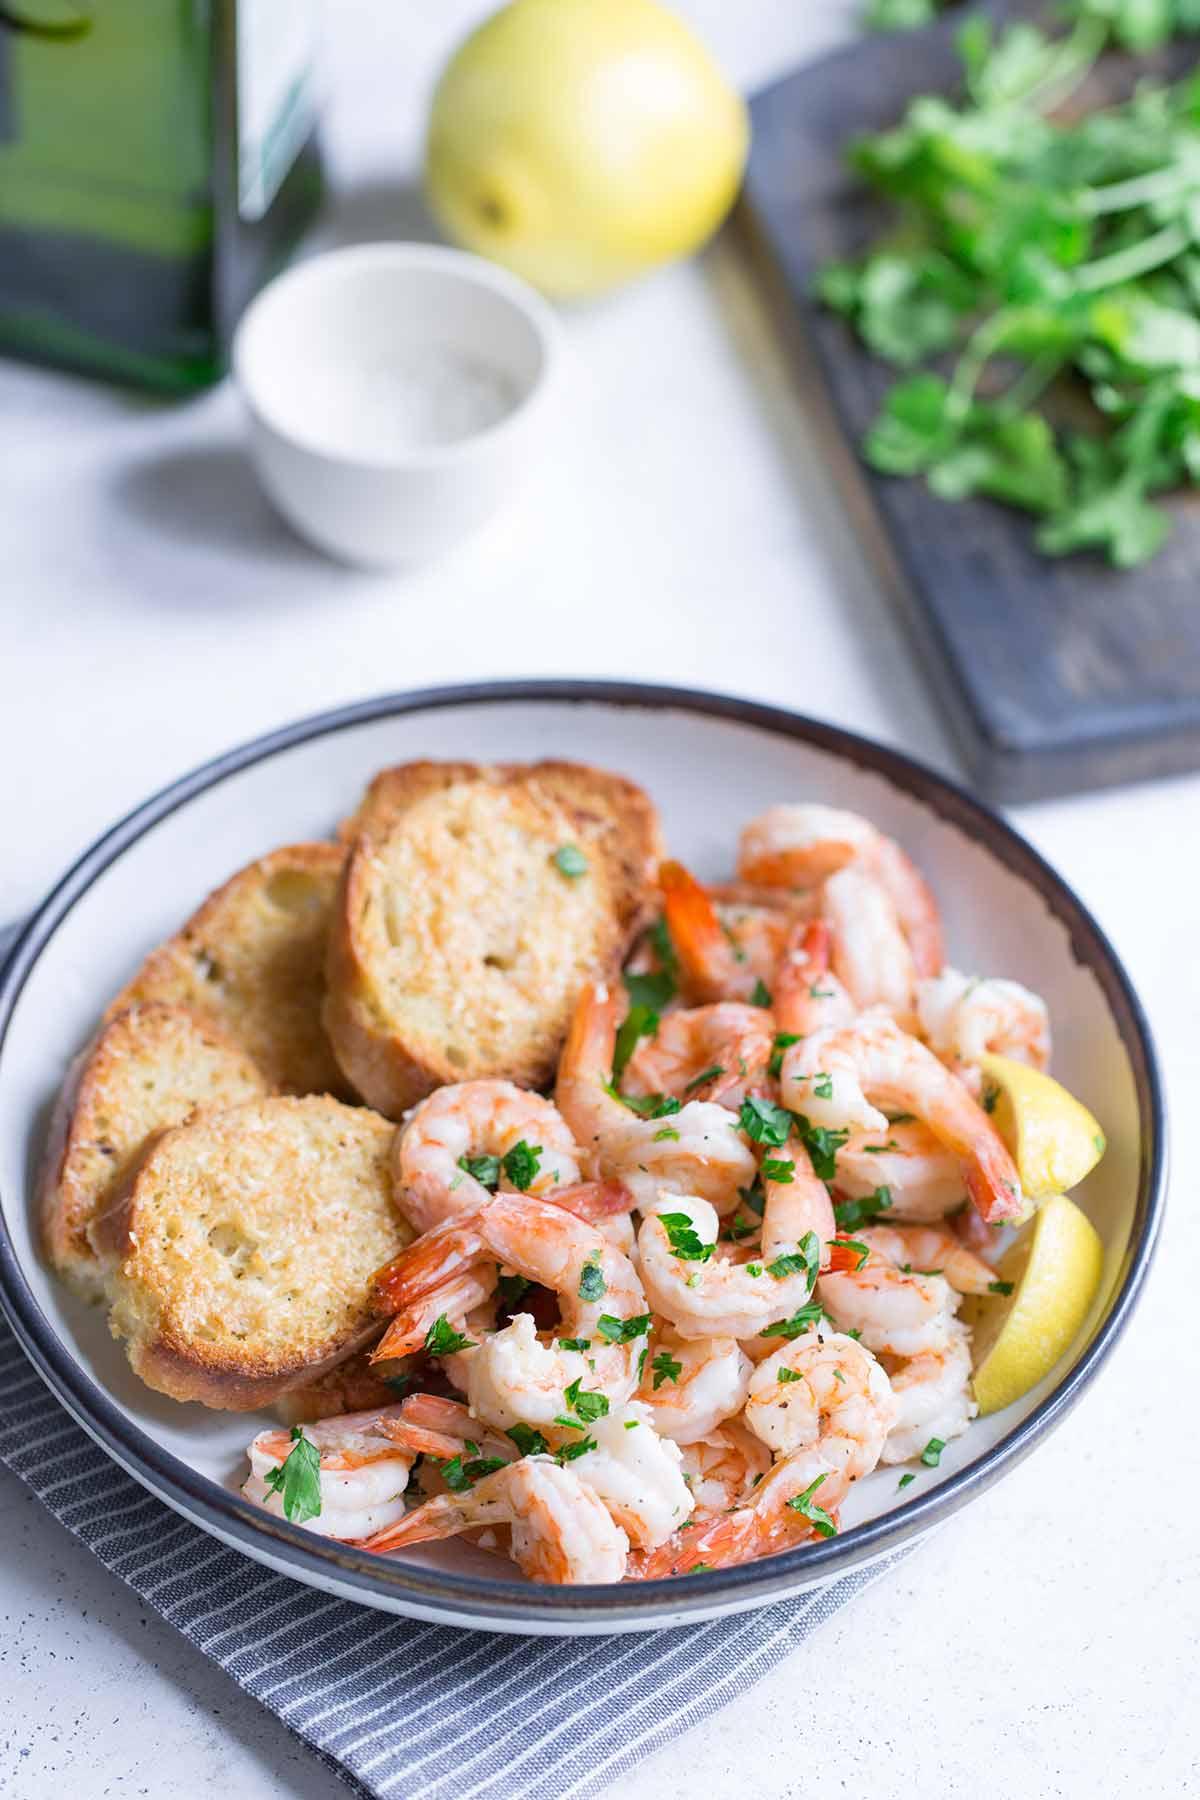 Bowl with garlic butter shrimp scampi